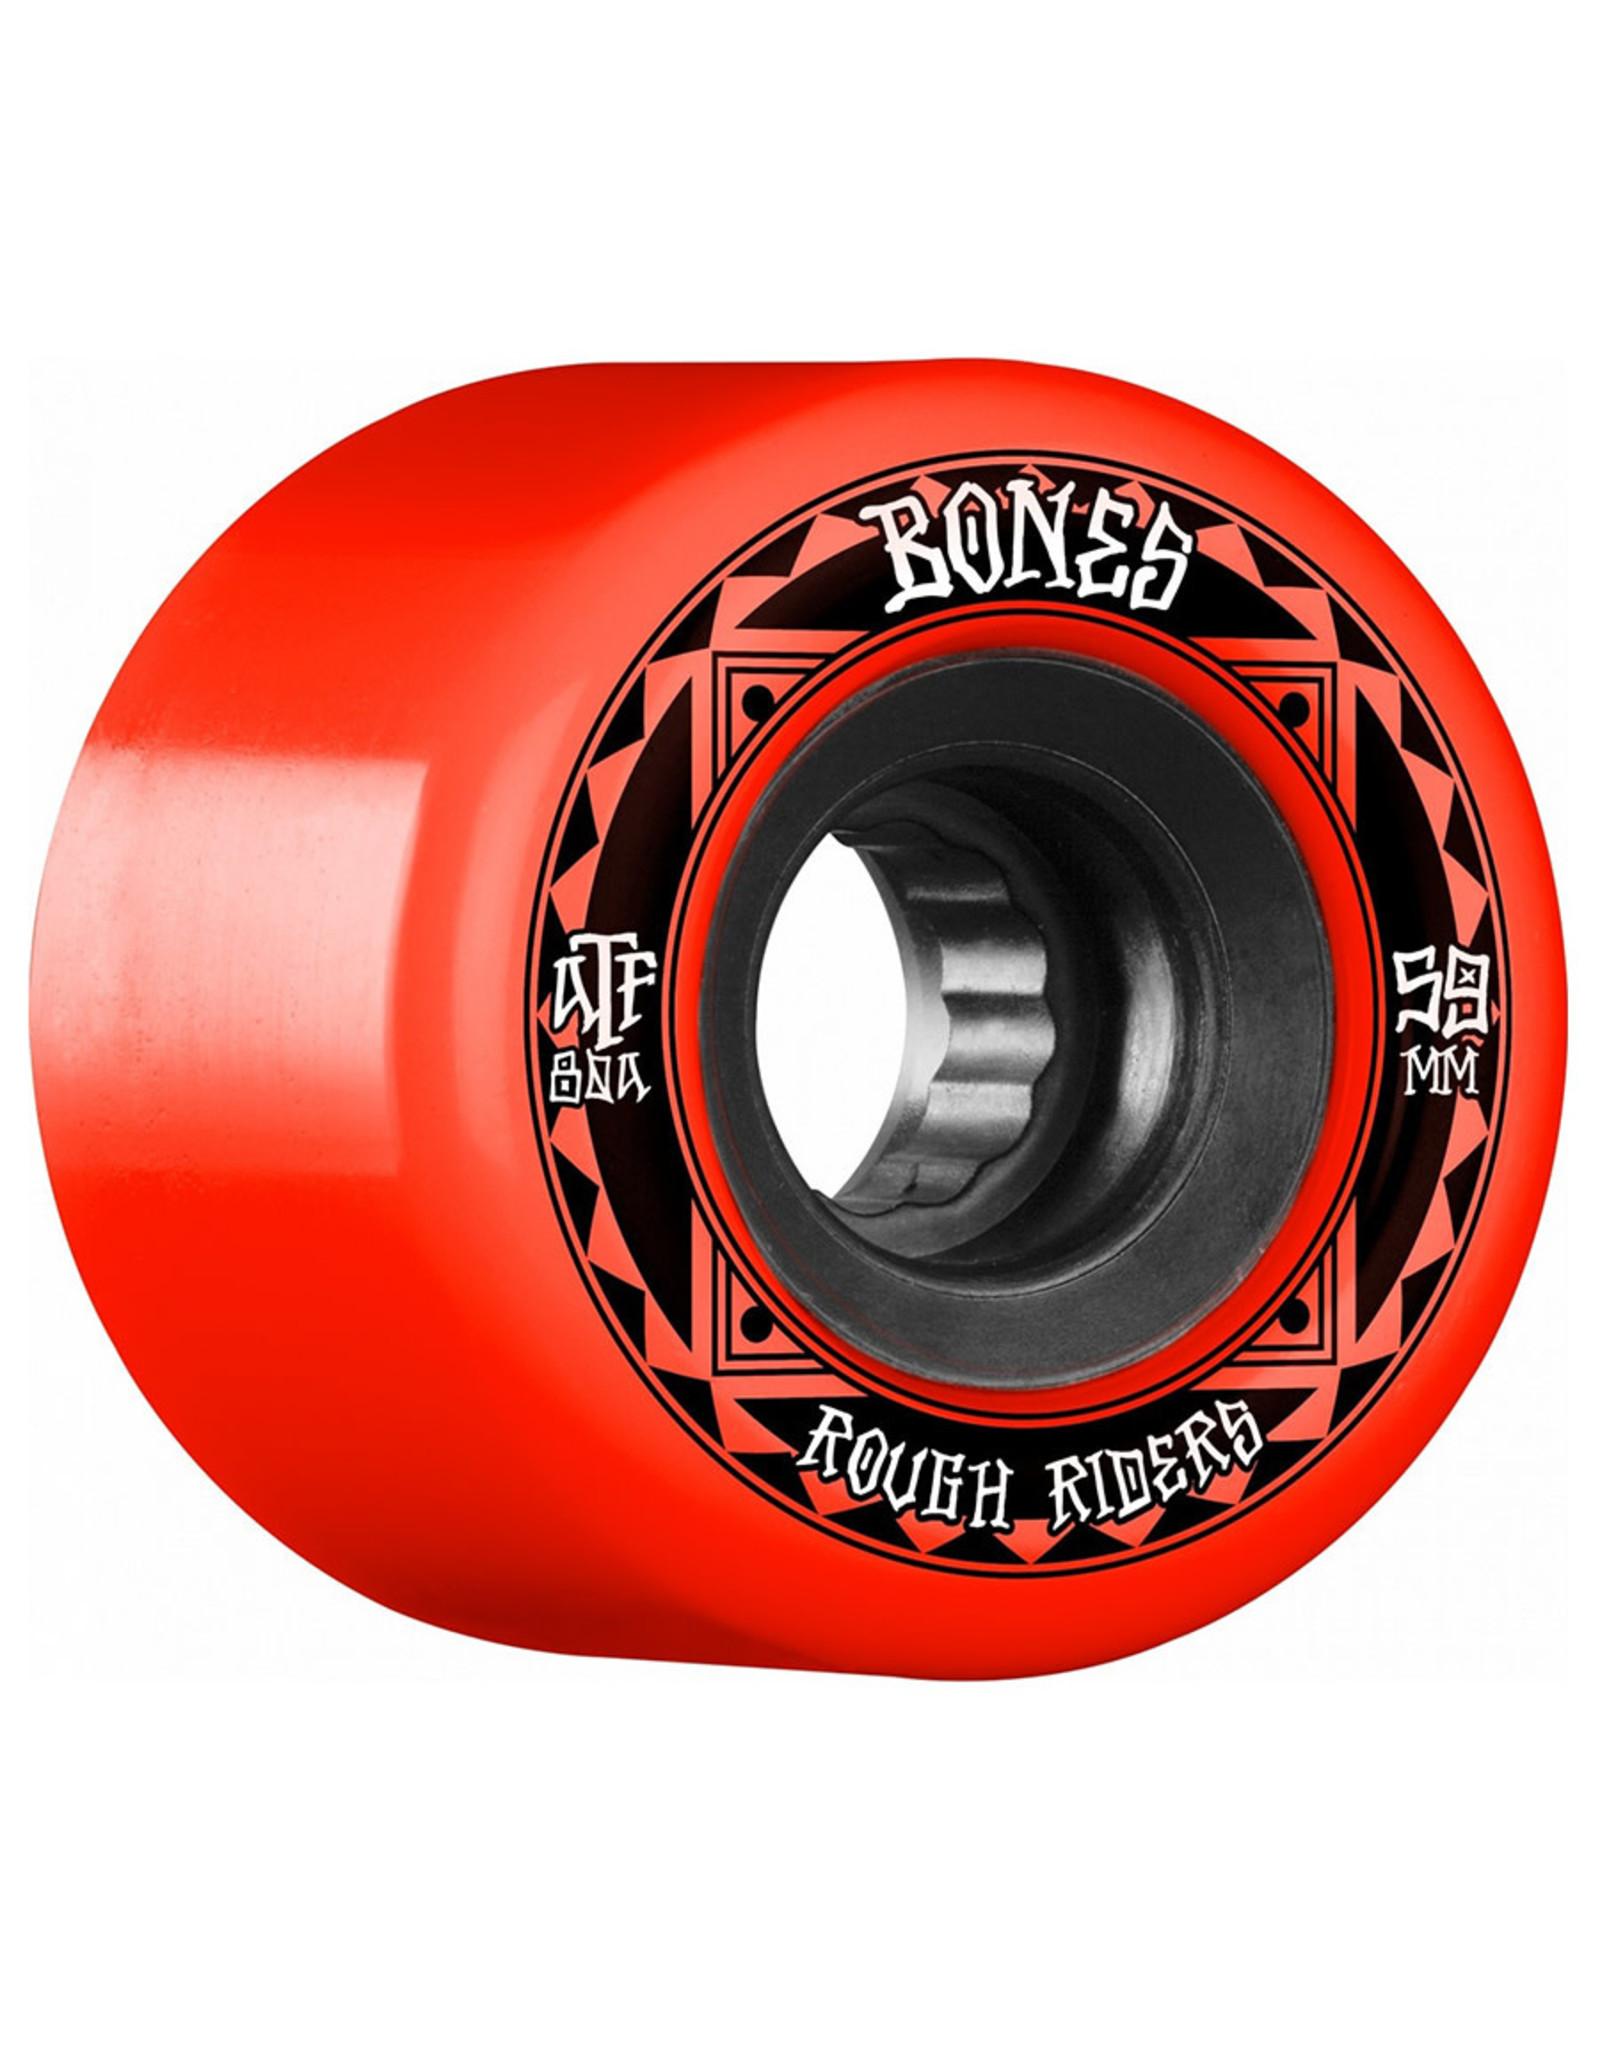 Bones Bones Wheels ATF Rough Riders Runners Red (59mm/80a)